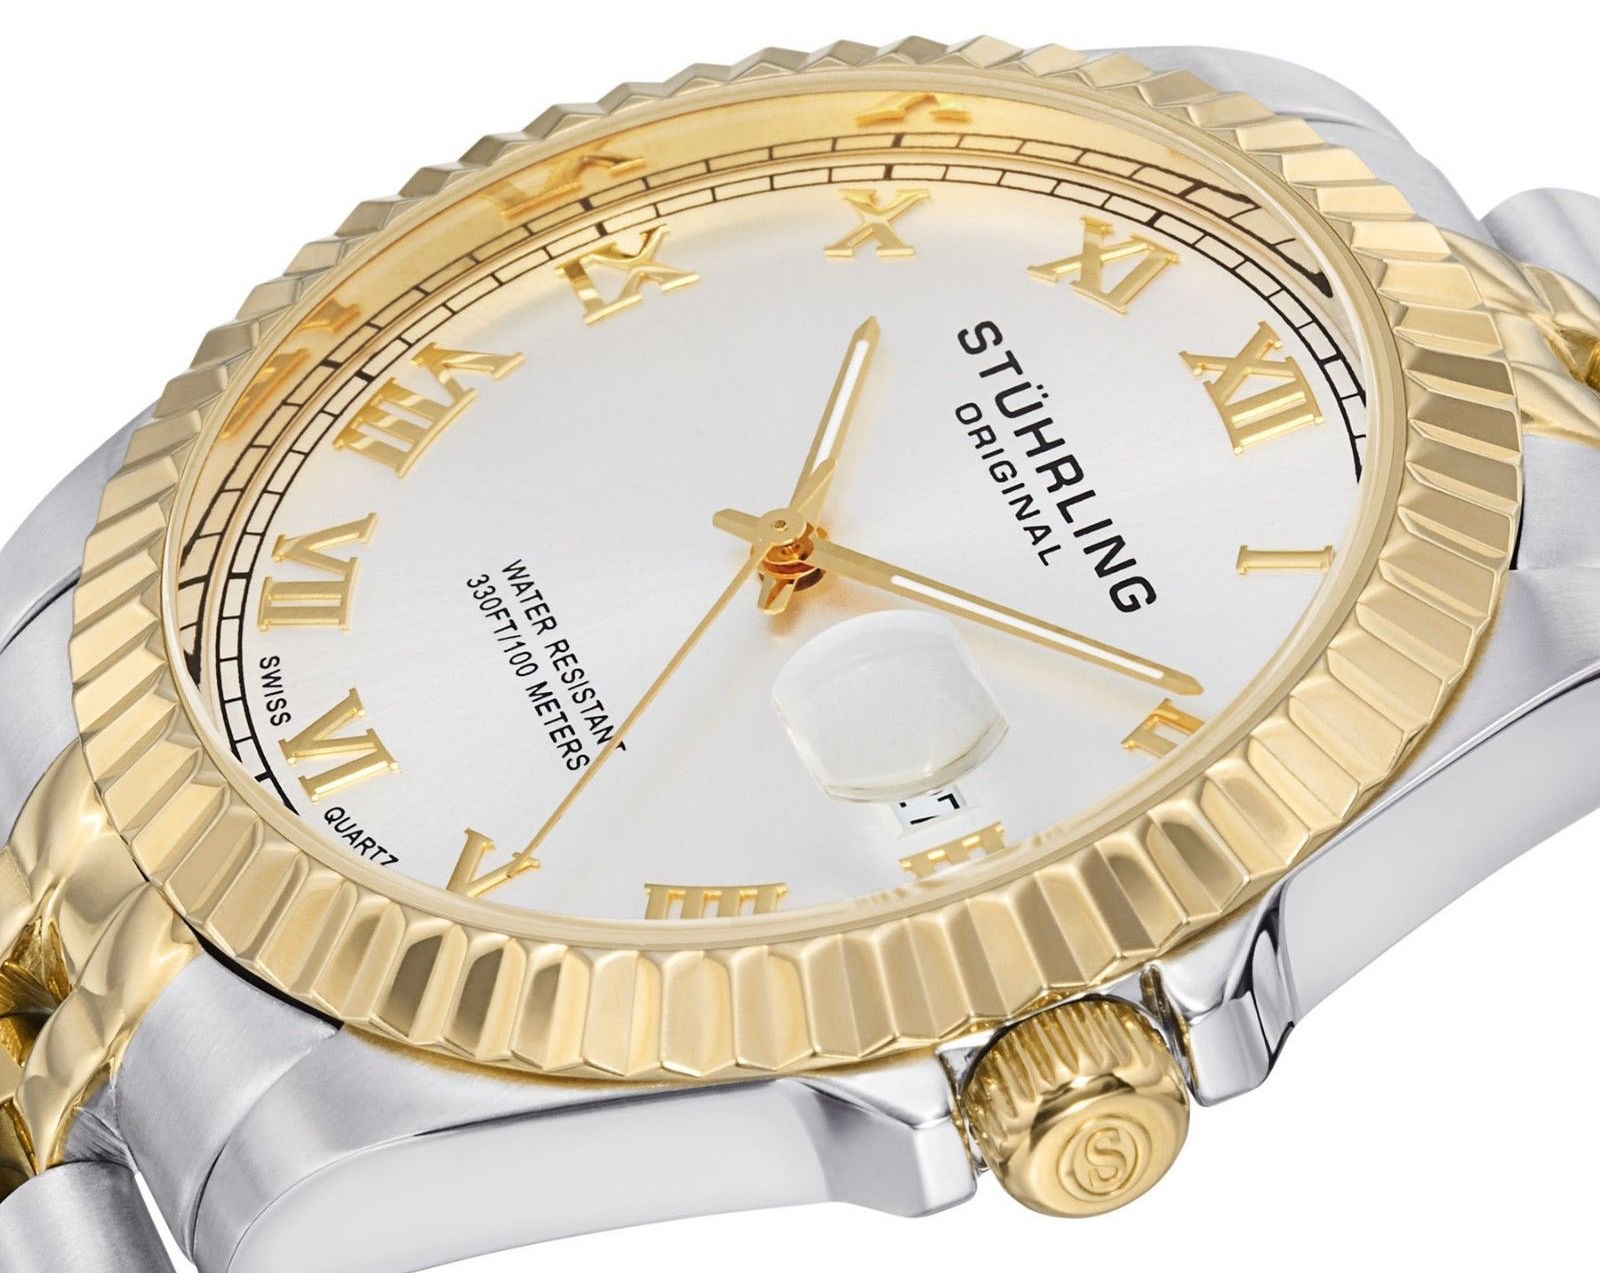 Stuhrling Original 599g 04 Analog Watch Review Watchreviewblog